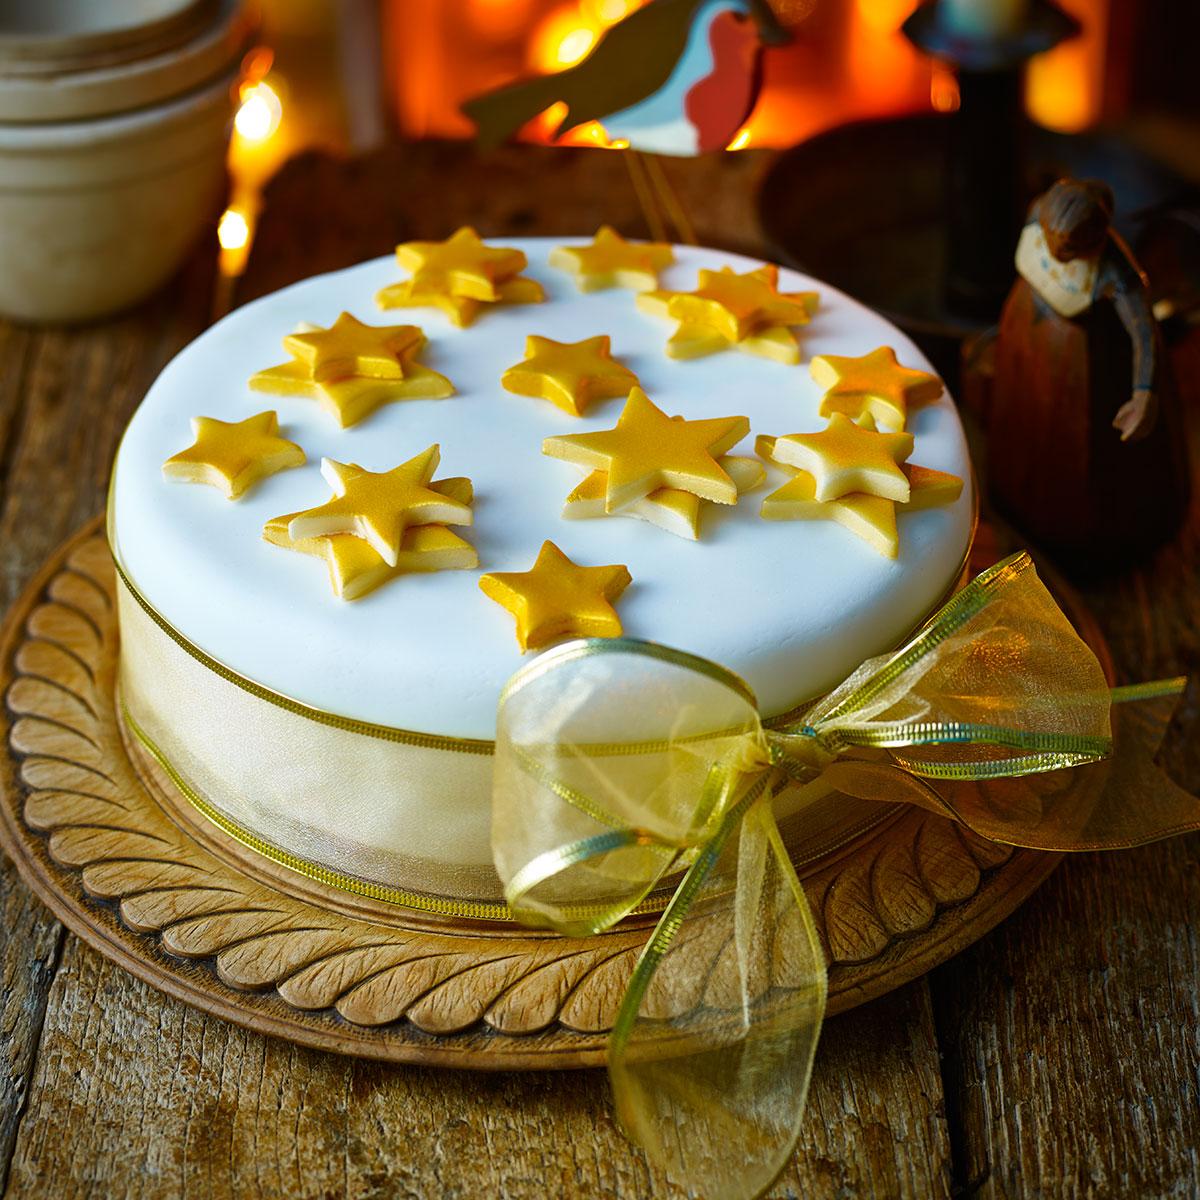 Simple Iced Christmas Cake